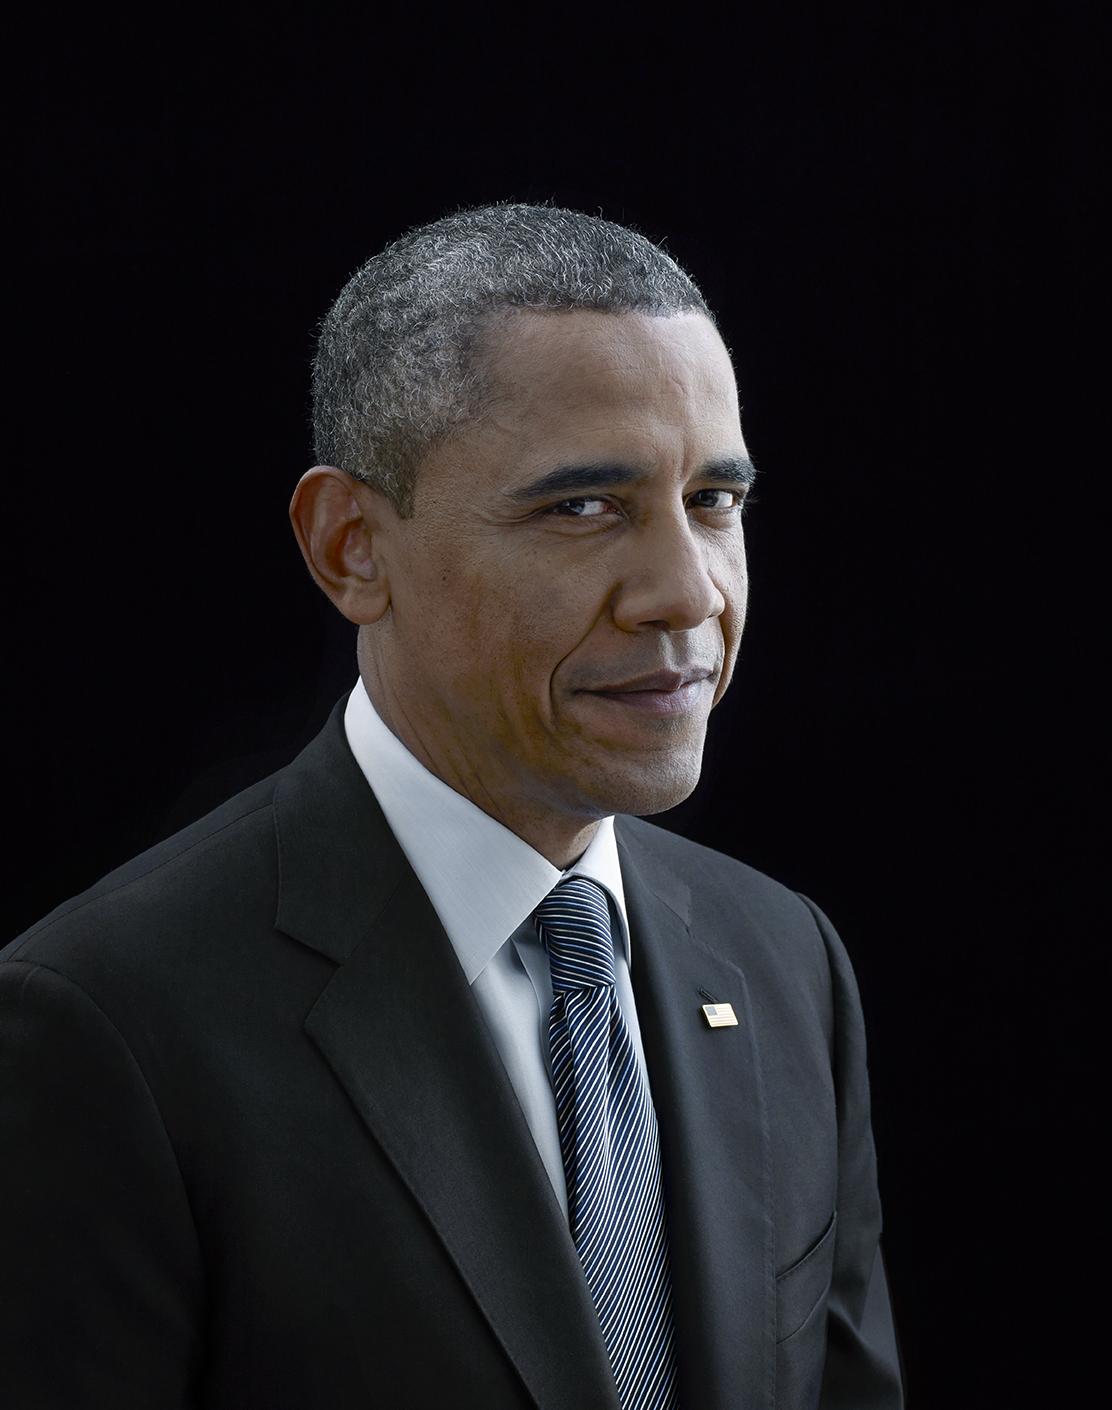 Barack_Obama_Chris_Buck_41715_2_smile_crop2_flat4_forCarl.jpg